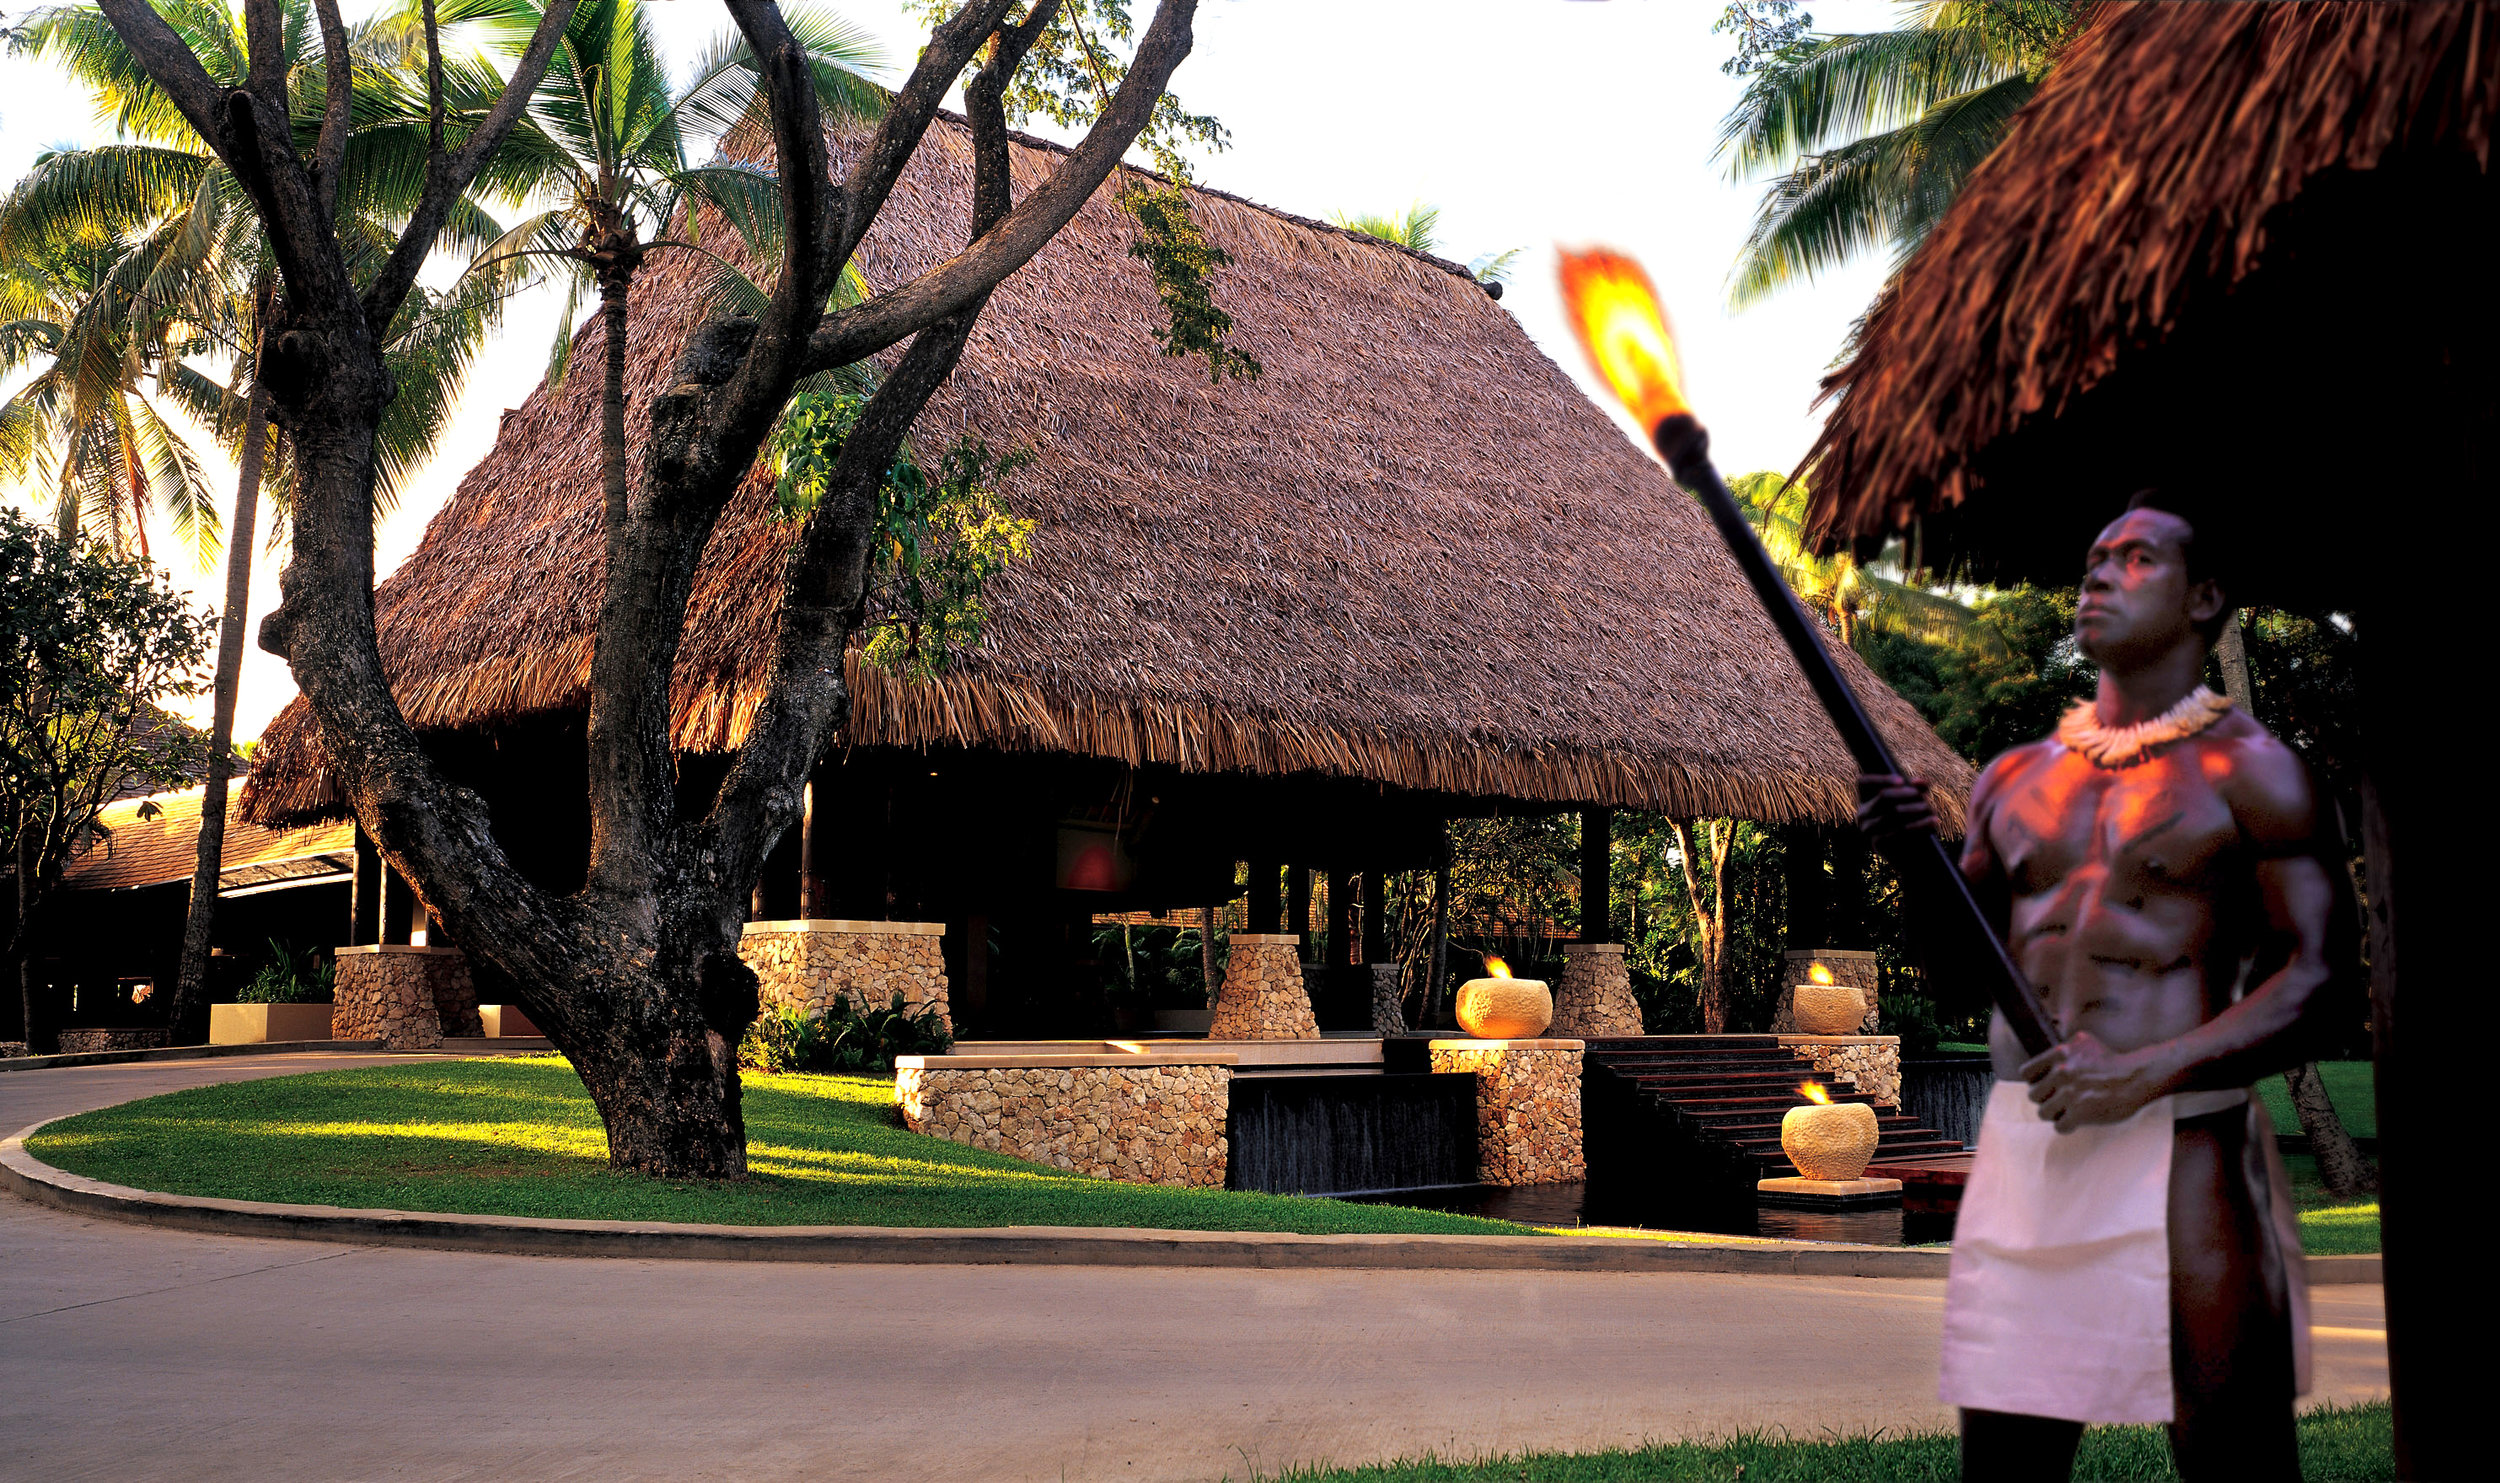 Westin-Denarau-Island-Resort-and-Spa-Fiji2966x1759.JPG